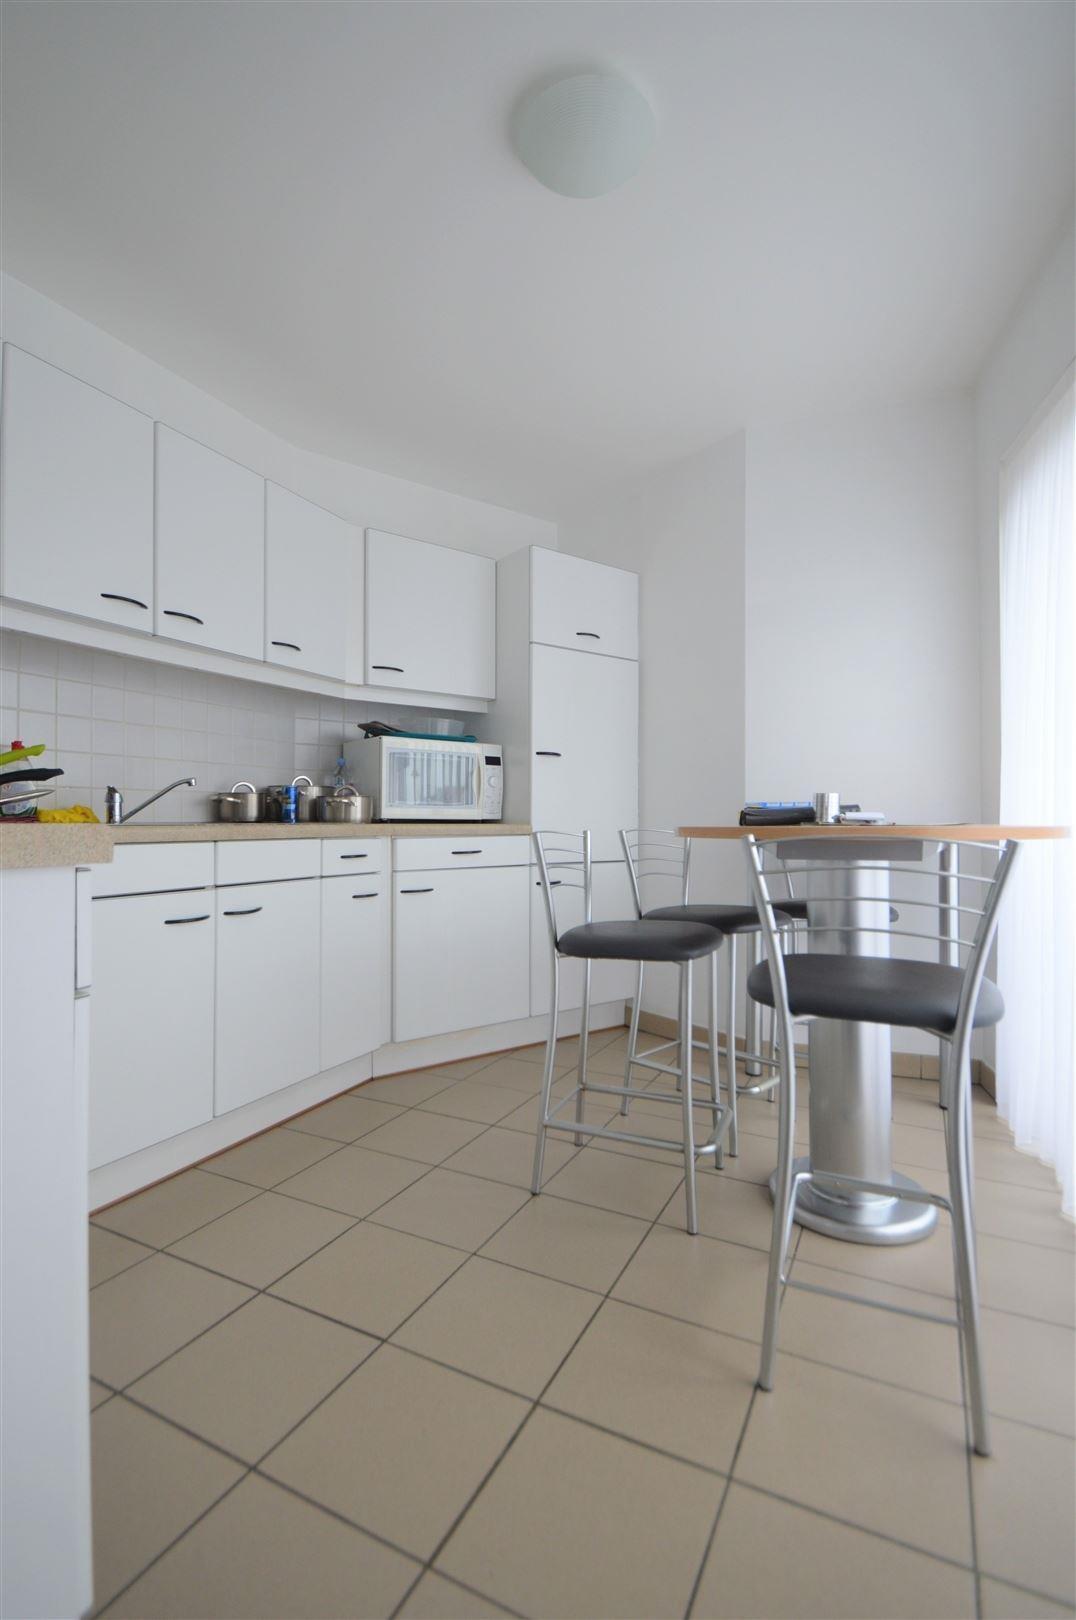 Foto 4 : Appartement te 9280 LEBBEKE (België) - Prijs € 650